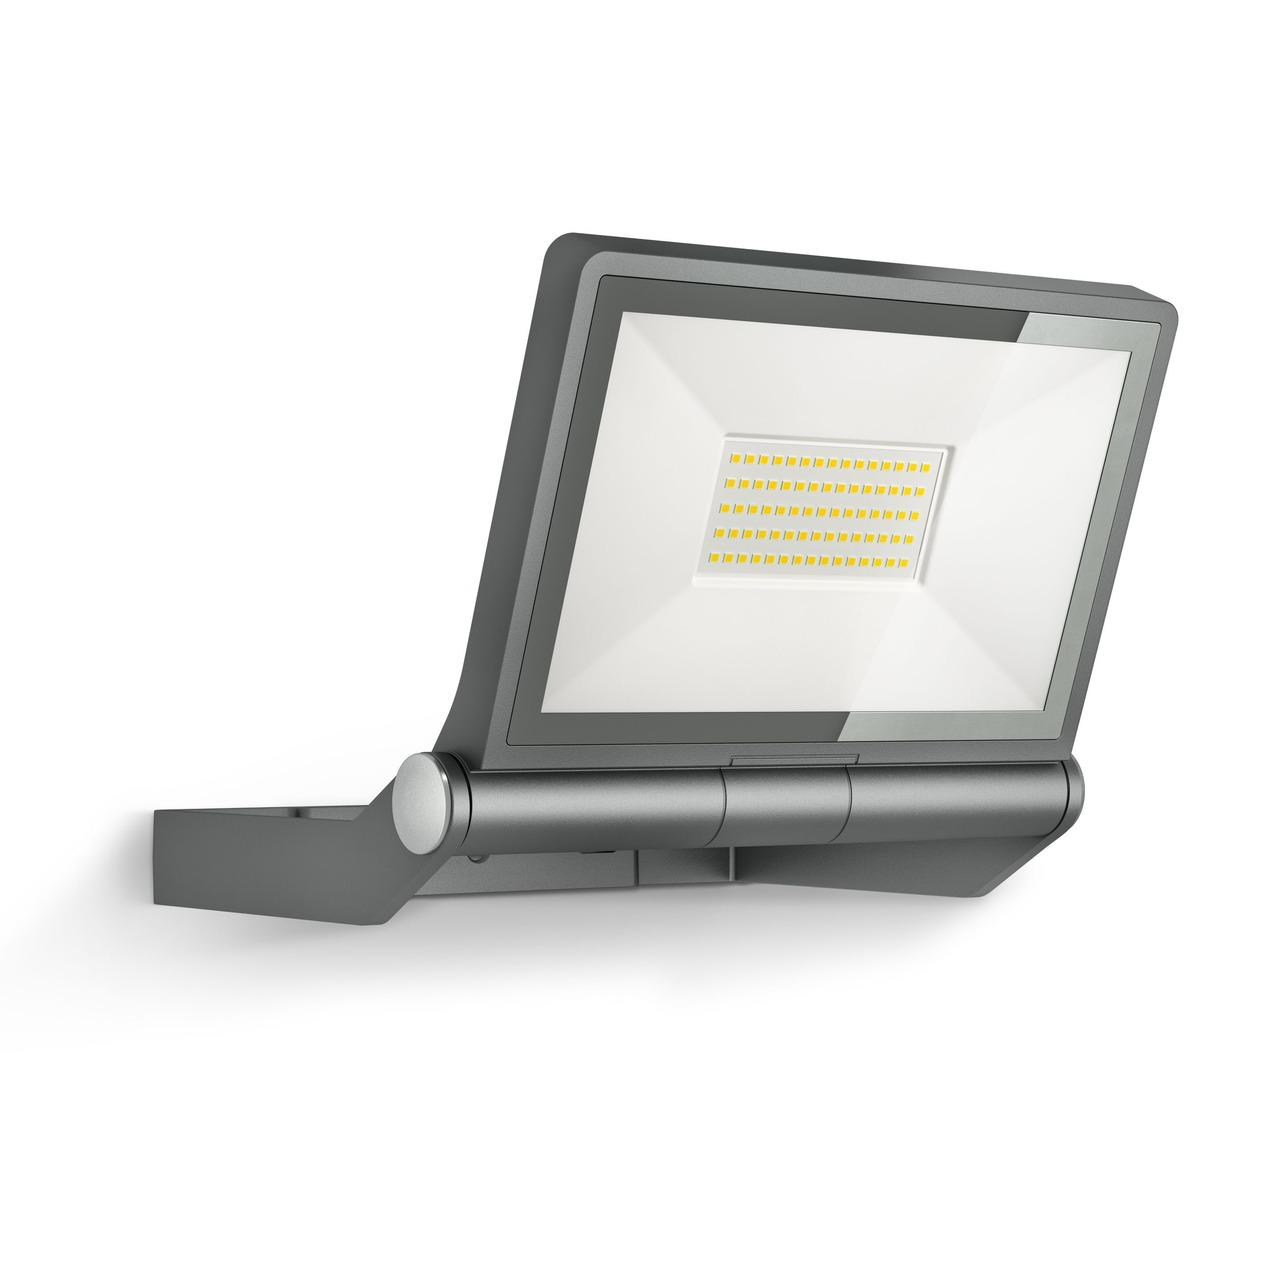 Steinel 43-W-LED-Strahler XLED ONE XL, 4400 lm, warmweiß, IP44